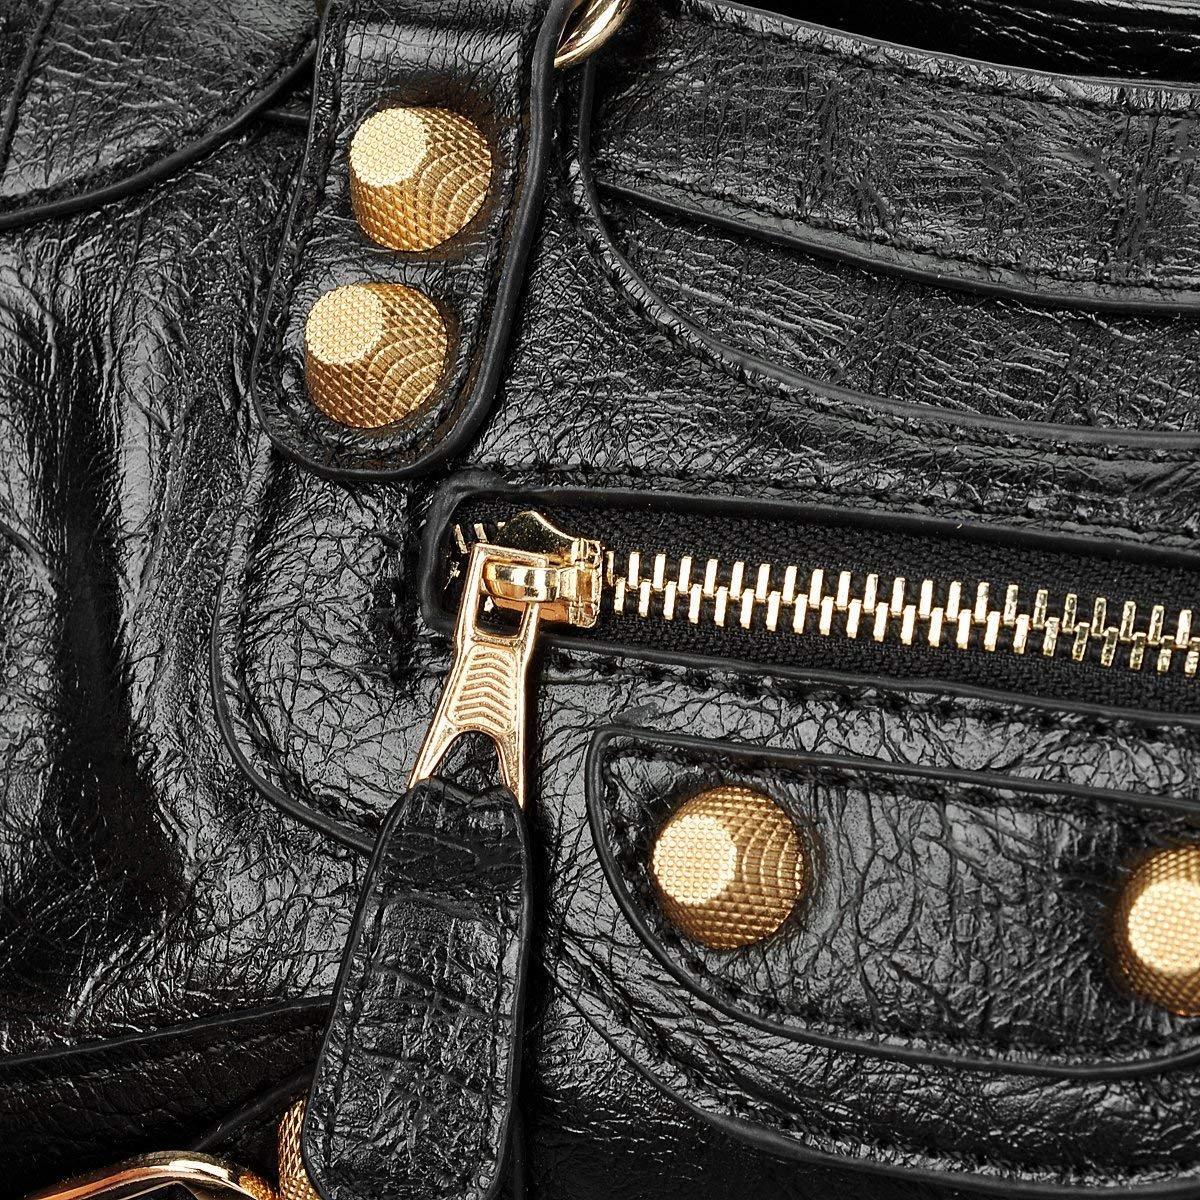 Gold-Tech Women Leather Big Gold Color Studed Motorcycle Bags 38cm Medium Size Shoulder Bag 2 Colors (24cm Black) by Gold-Tech (Image #4)